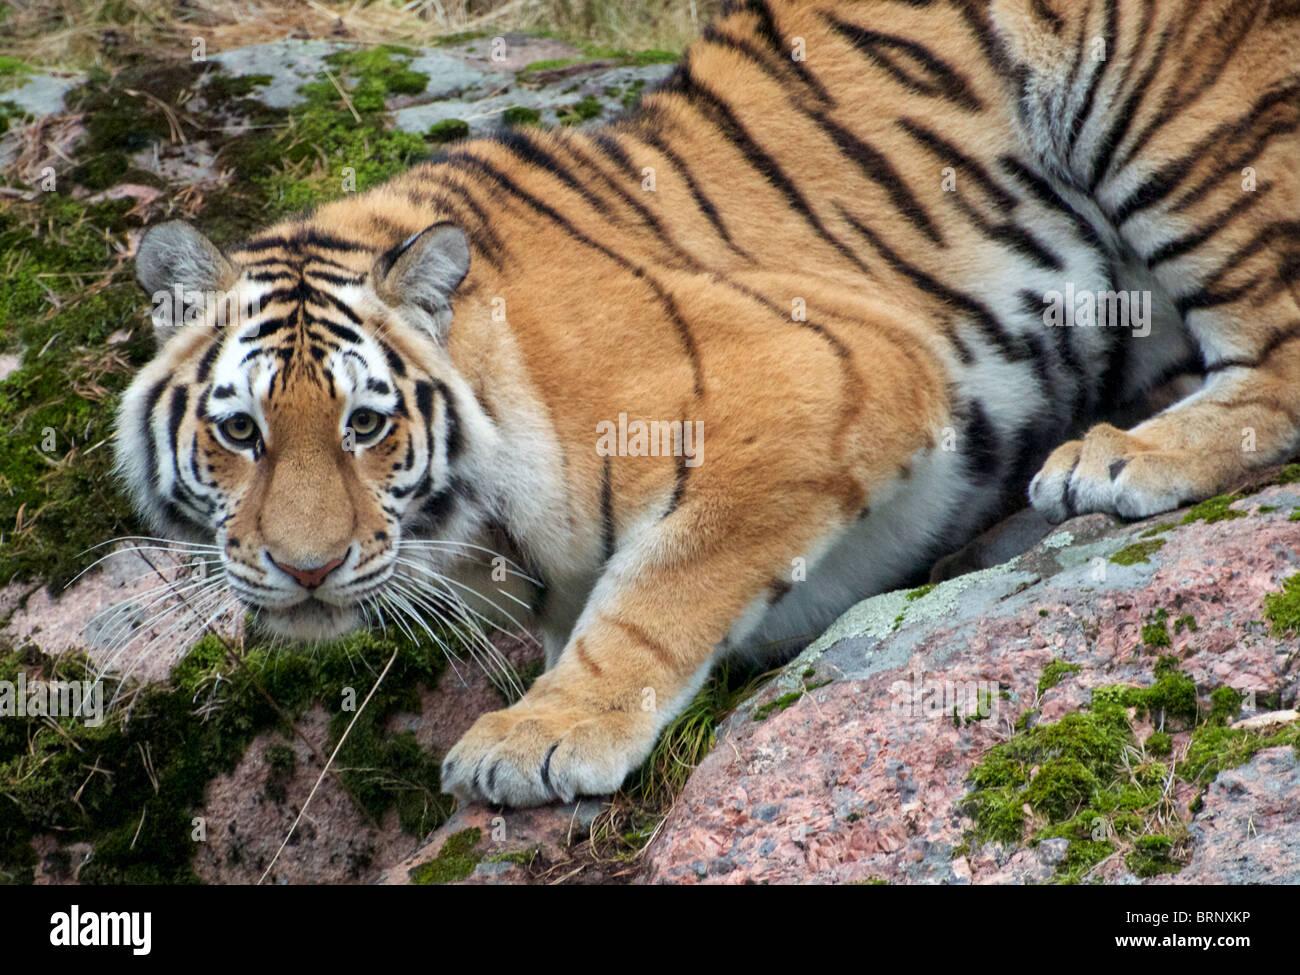 Female Amur (Siberian) tiger on rocks looking at camera - Stock Image